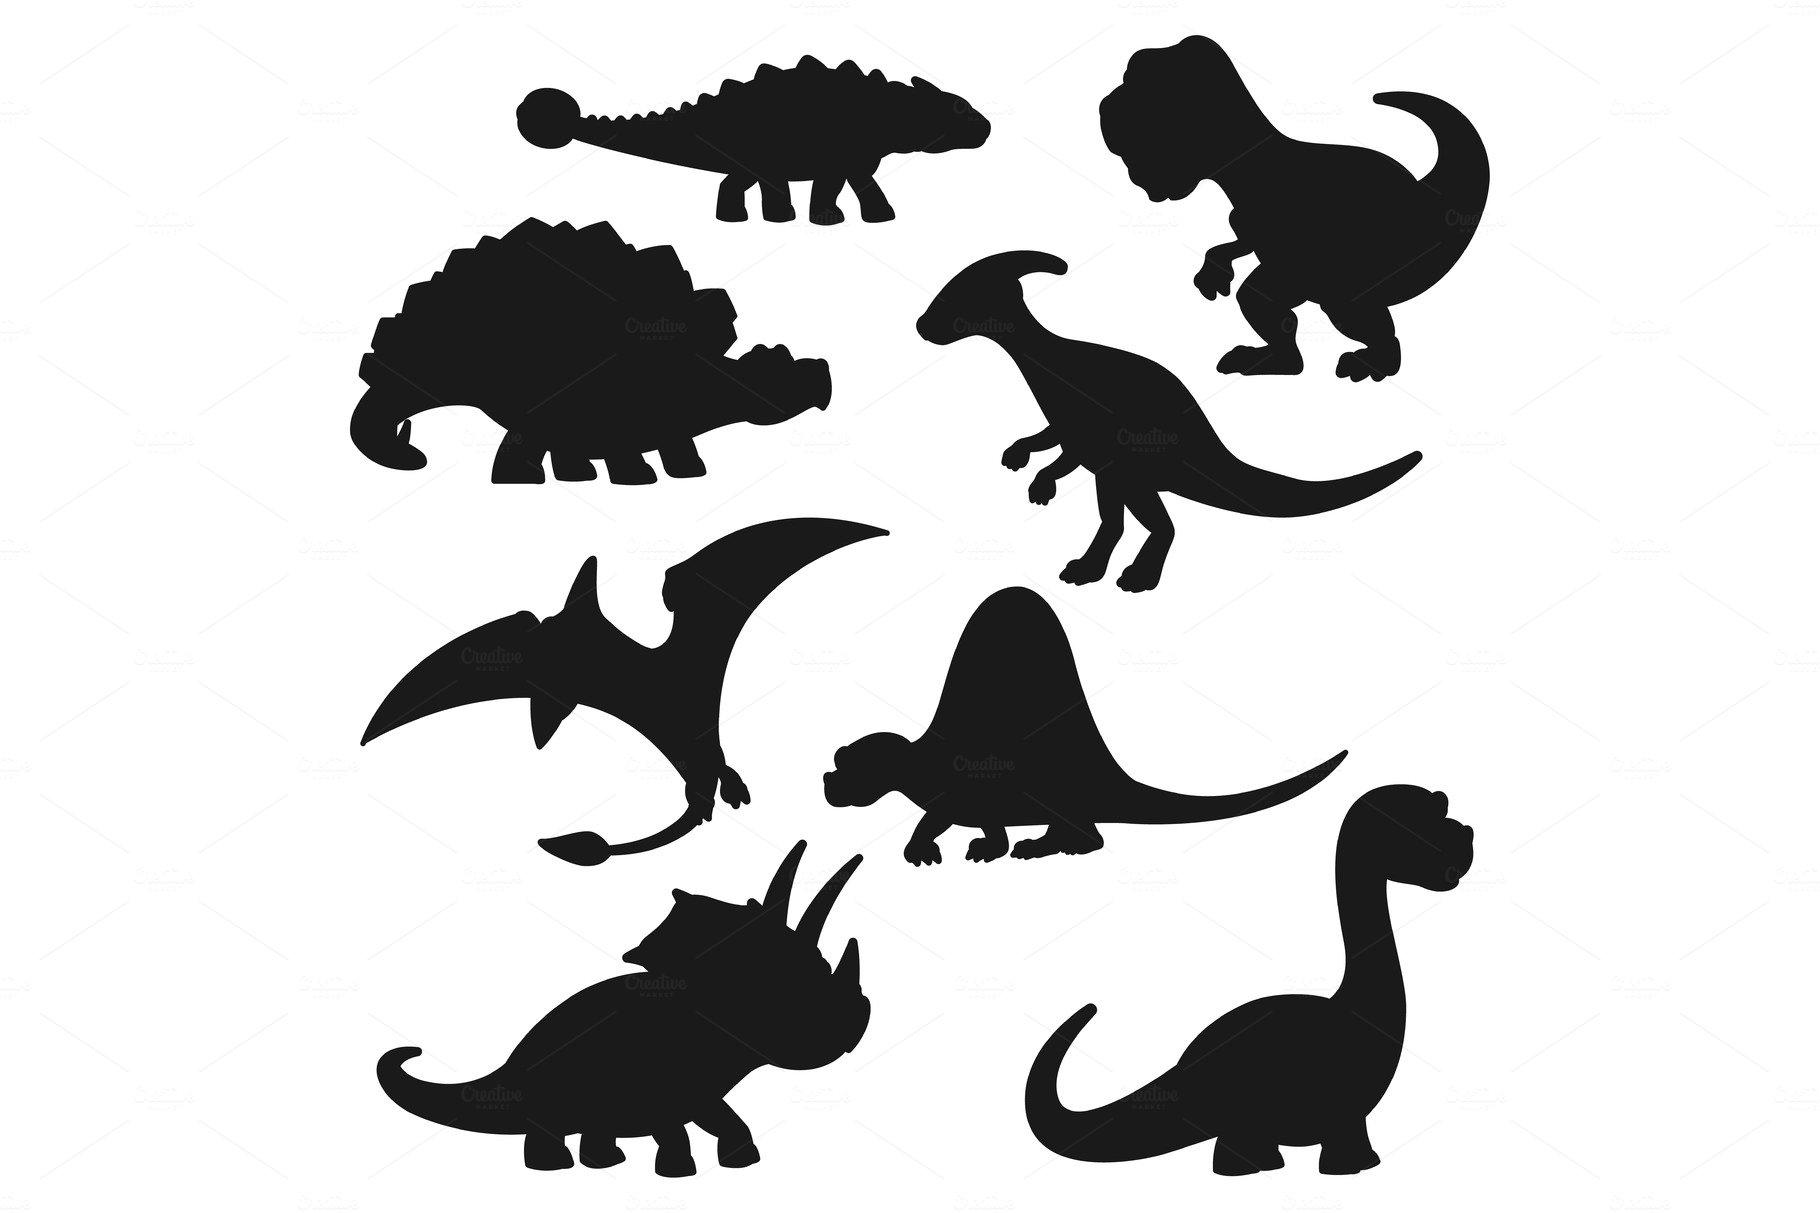 Black Silhouettes Of Dinosaurs Pre Designed Vector Graphics Creative Market Free dinosaur silhouette vector clipart. black silhouettes of dinosaurs